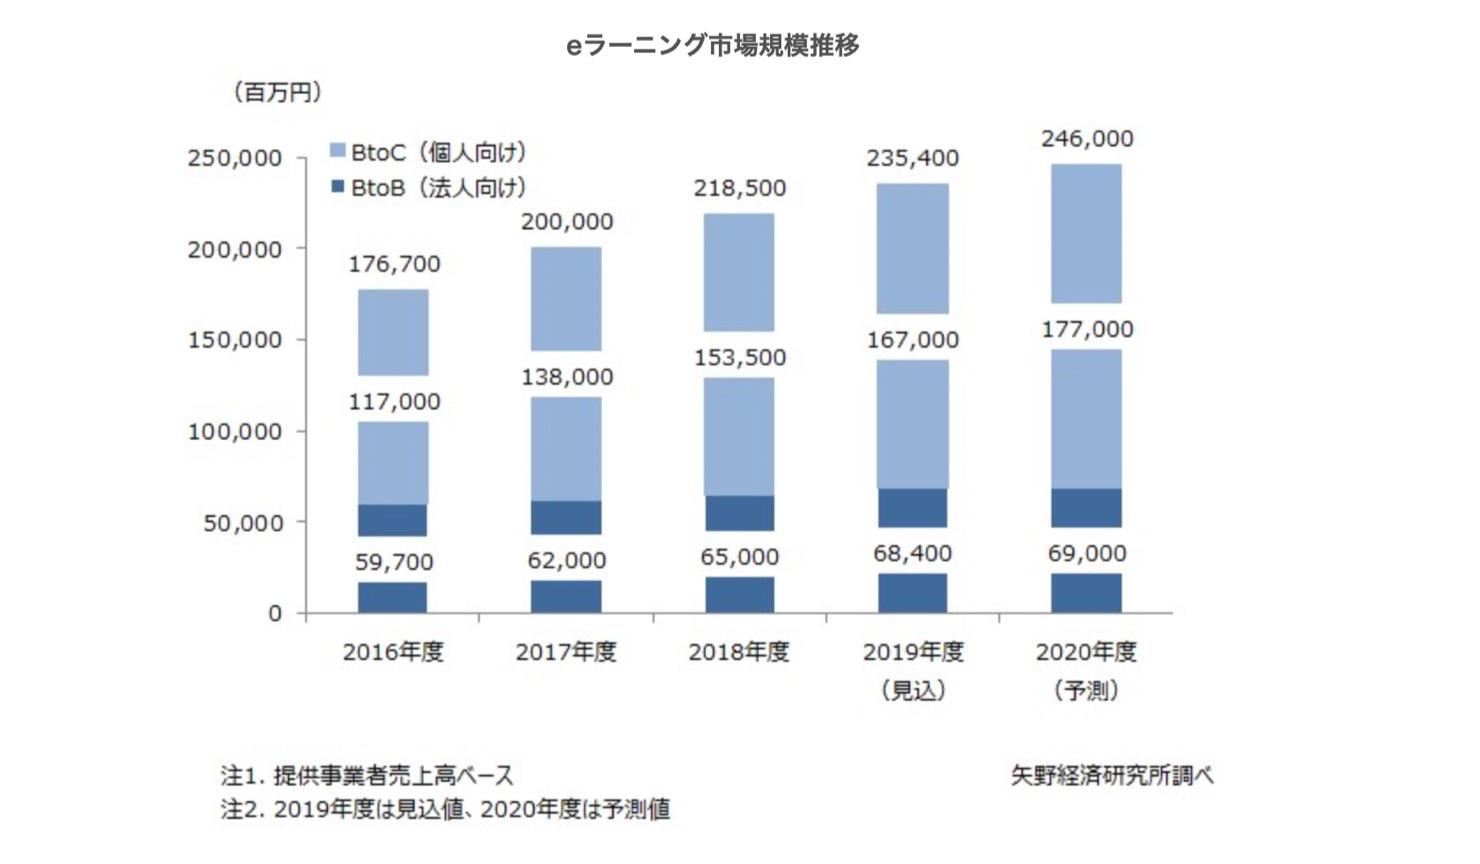 Japanese e-learning market